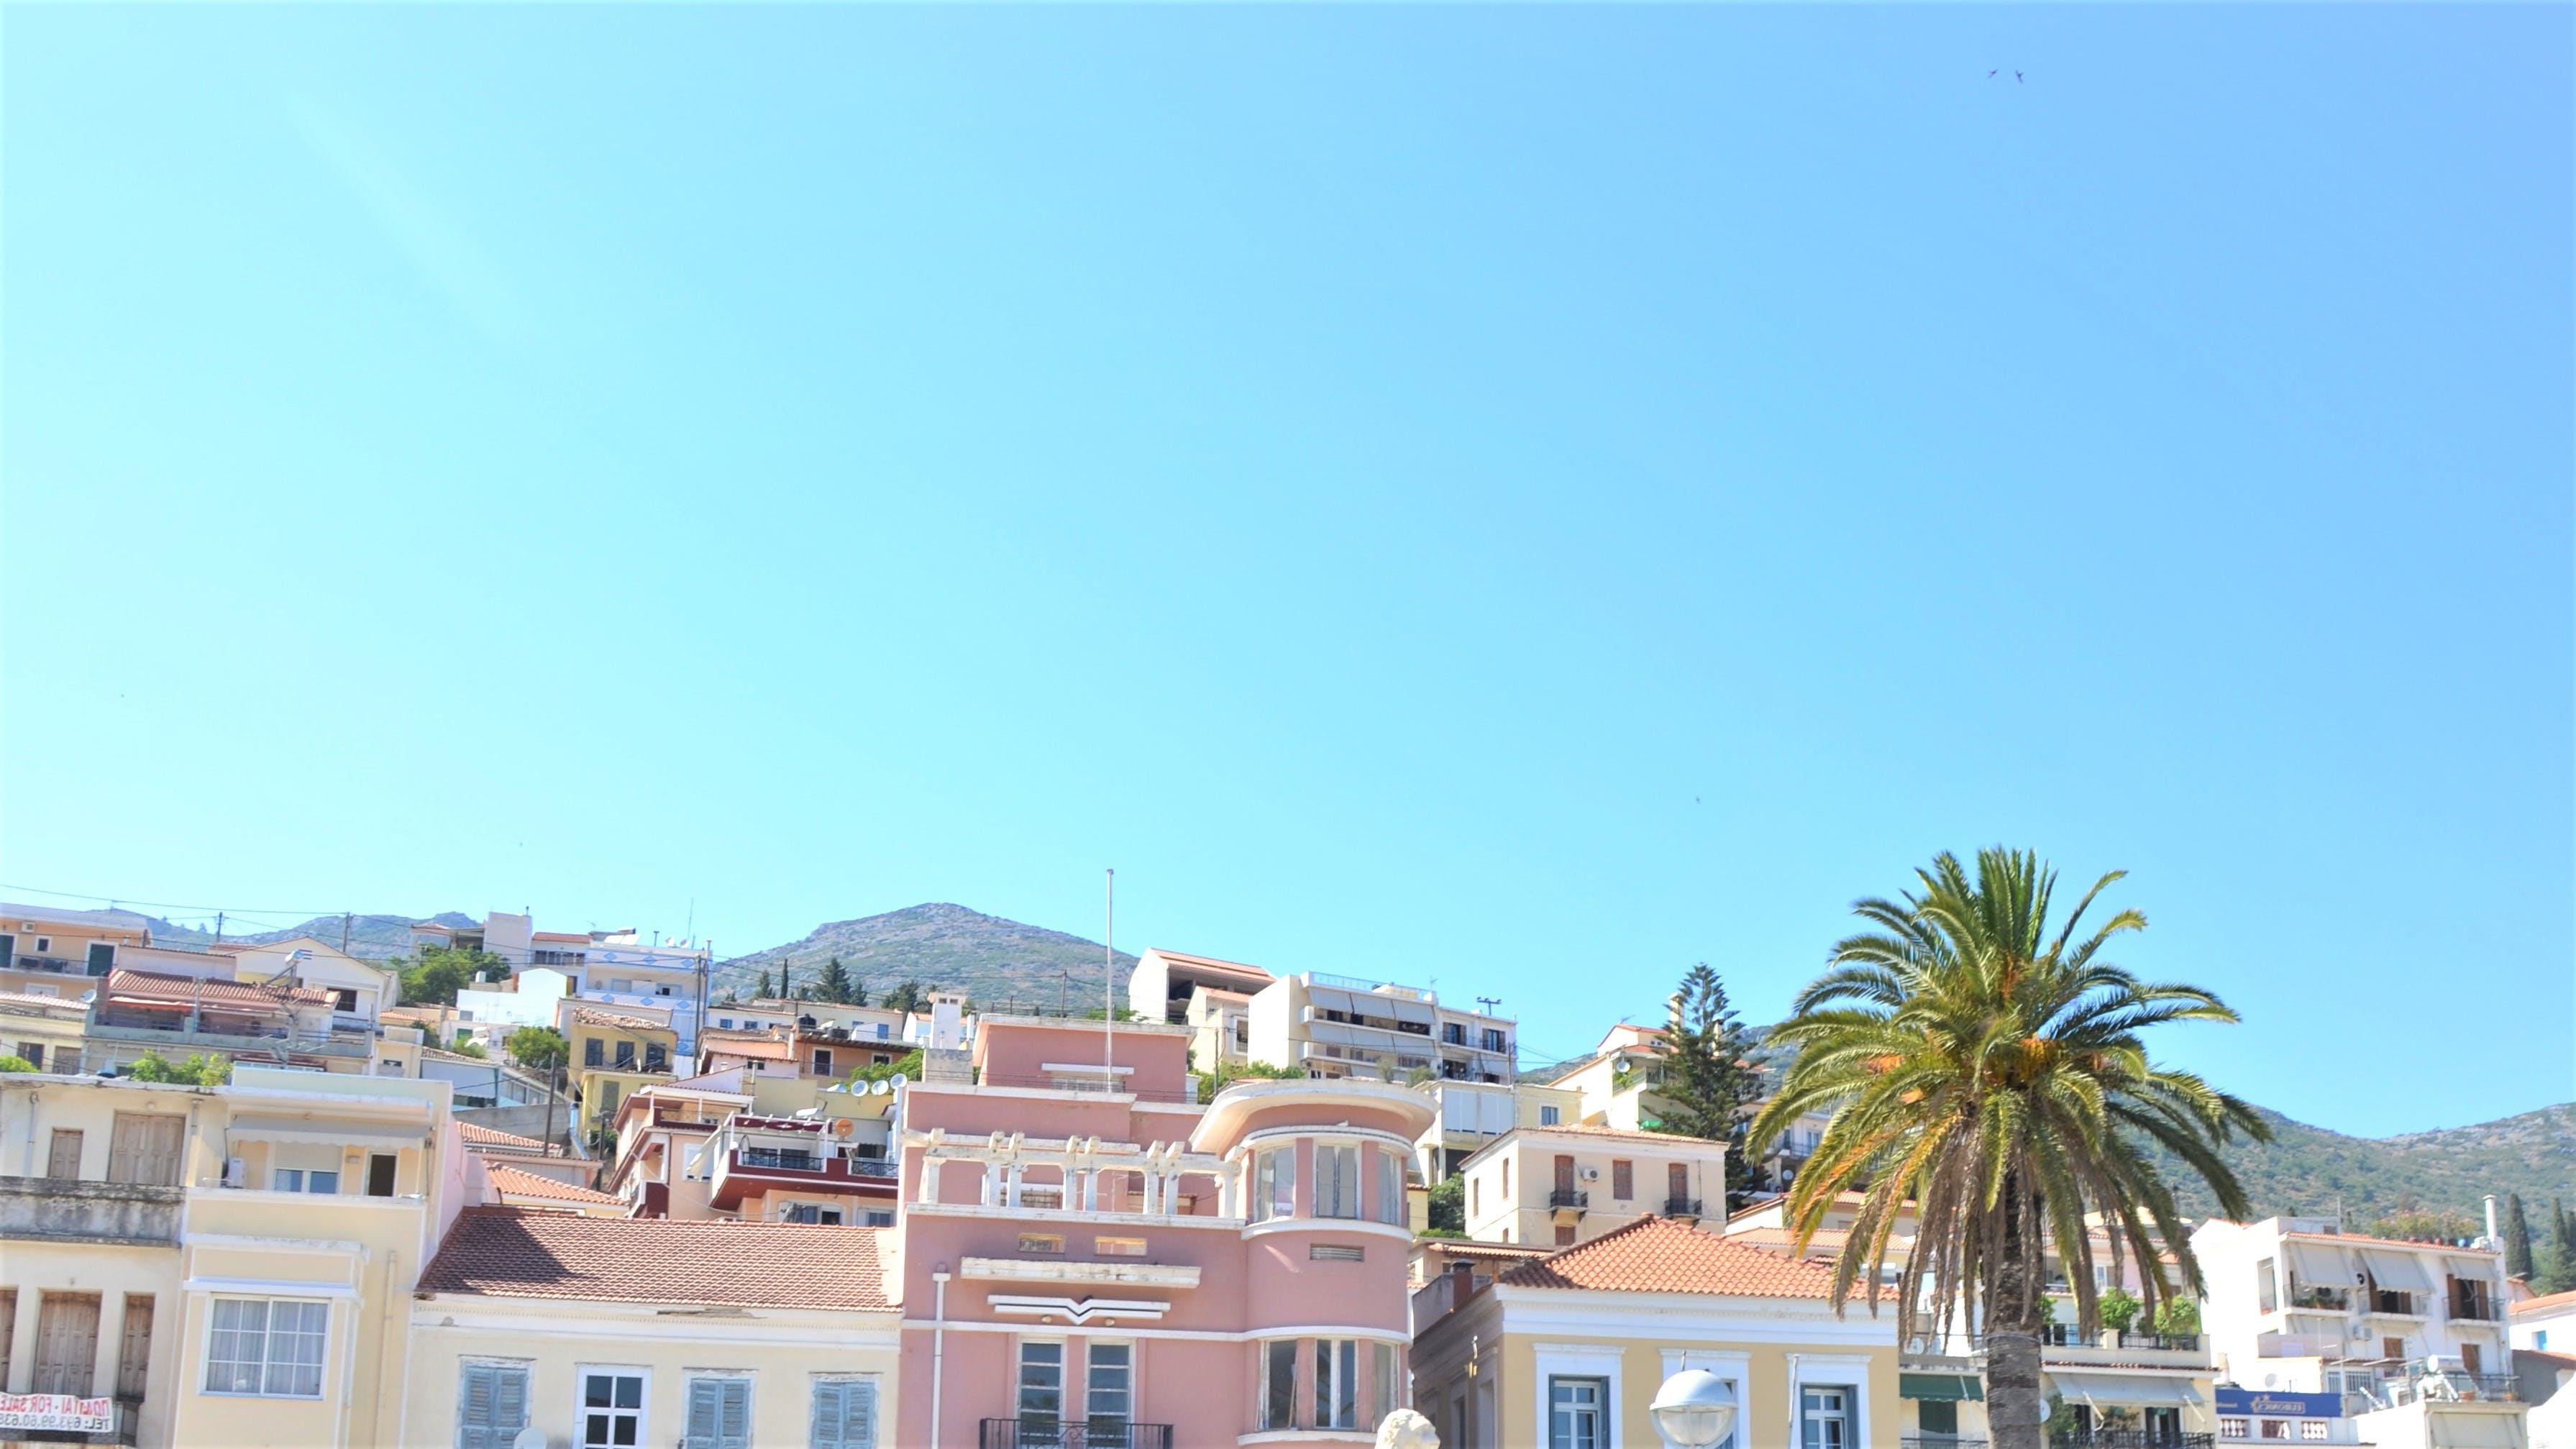 Free stock photo of greece, old house, palmtree, Samos